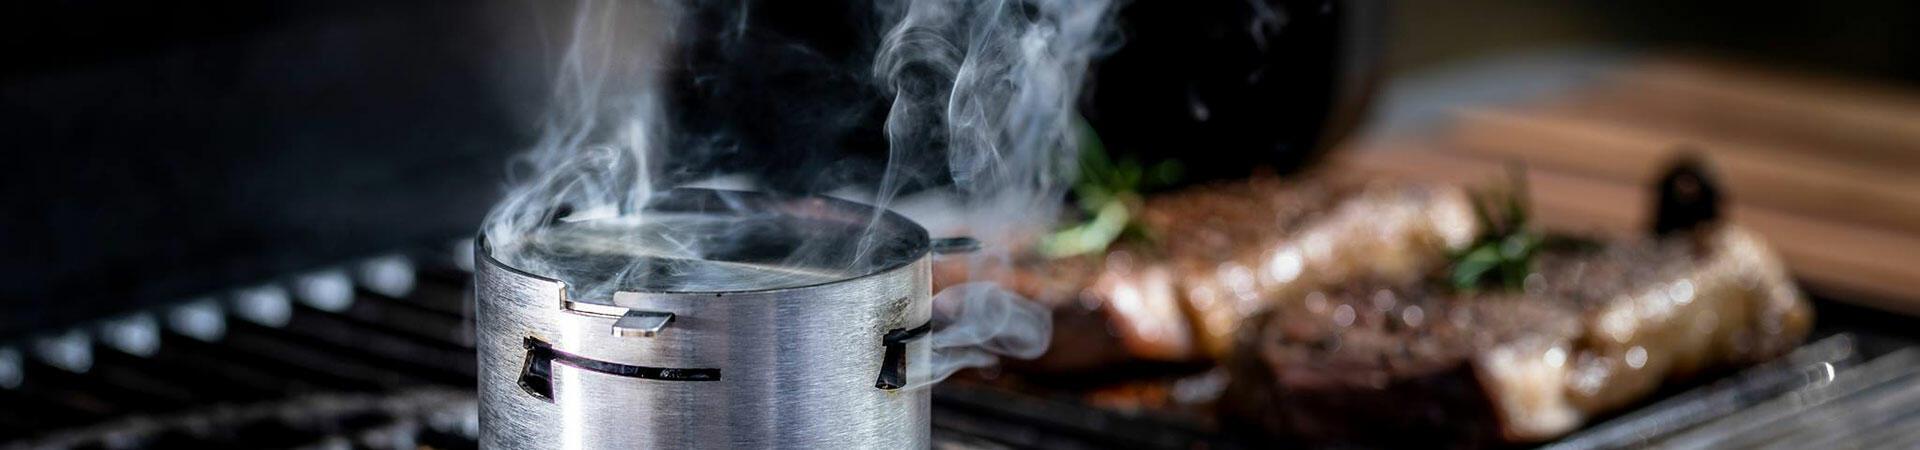 smoker cup rookmot